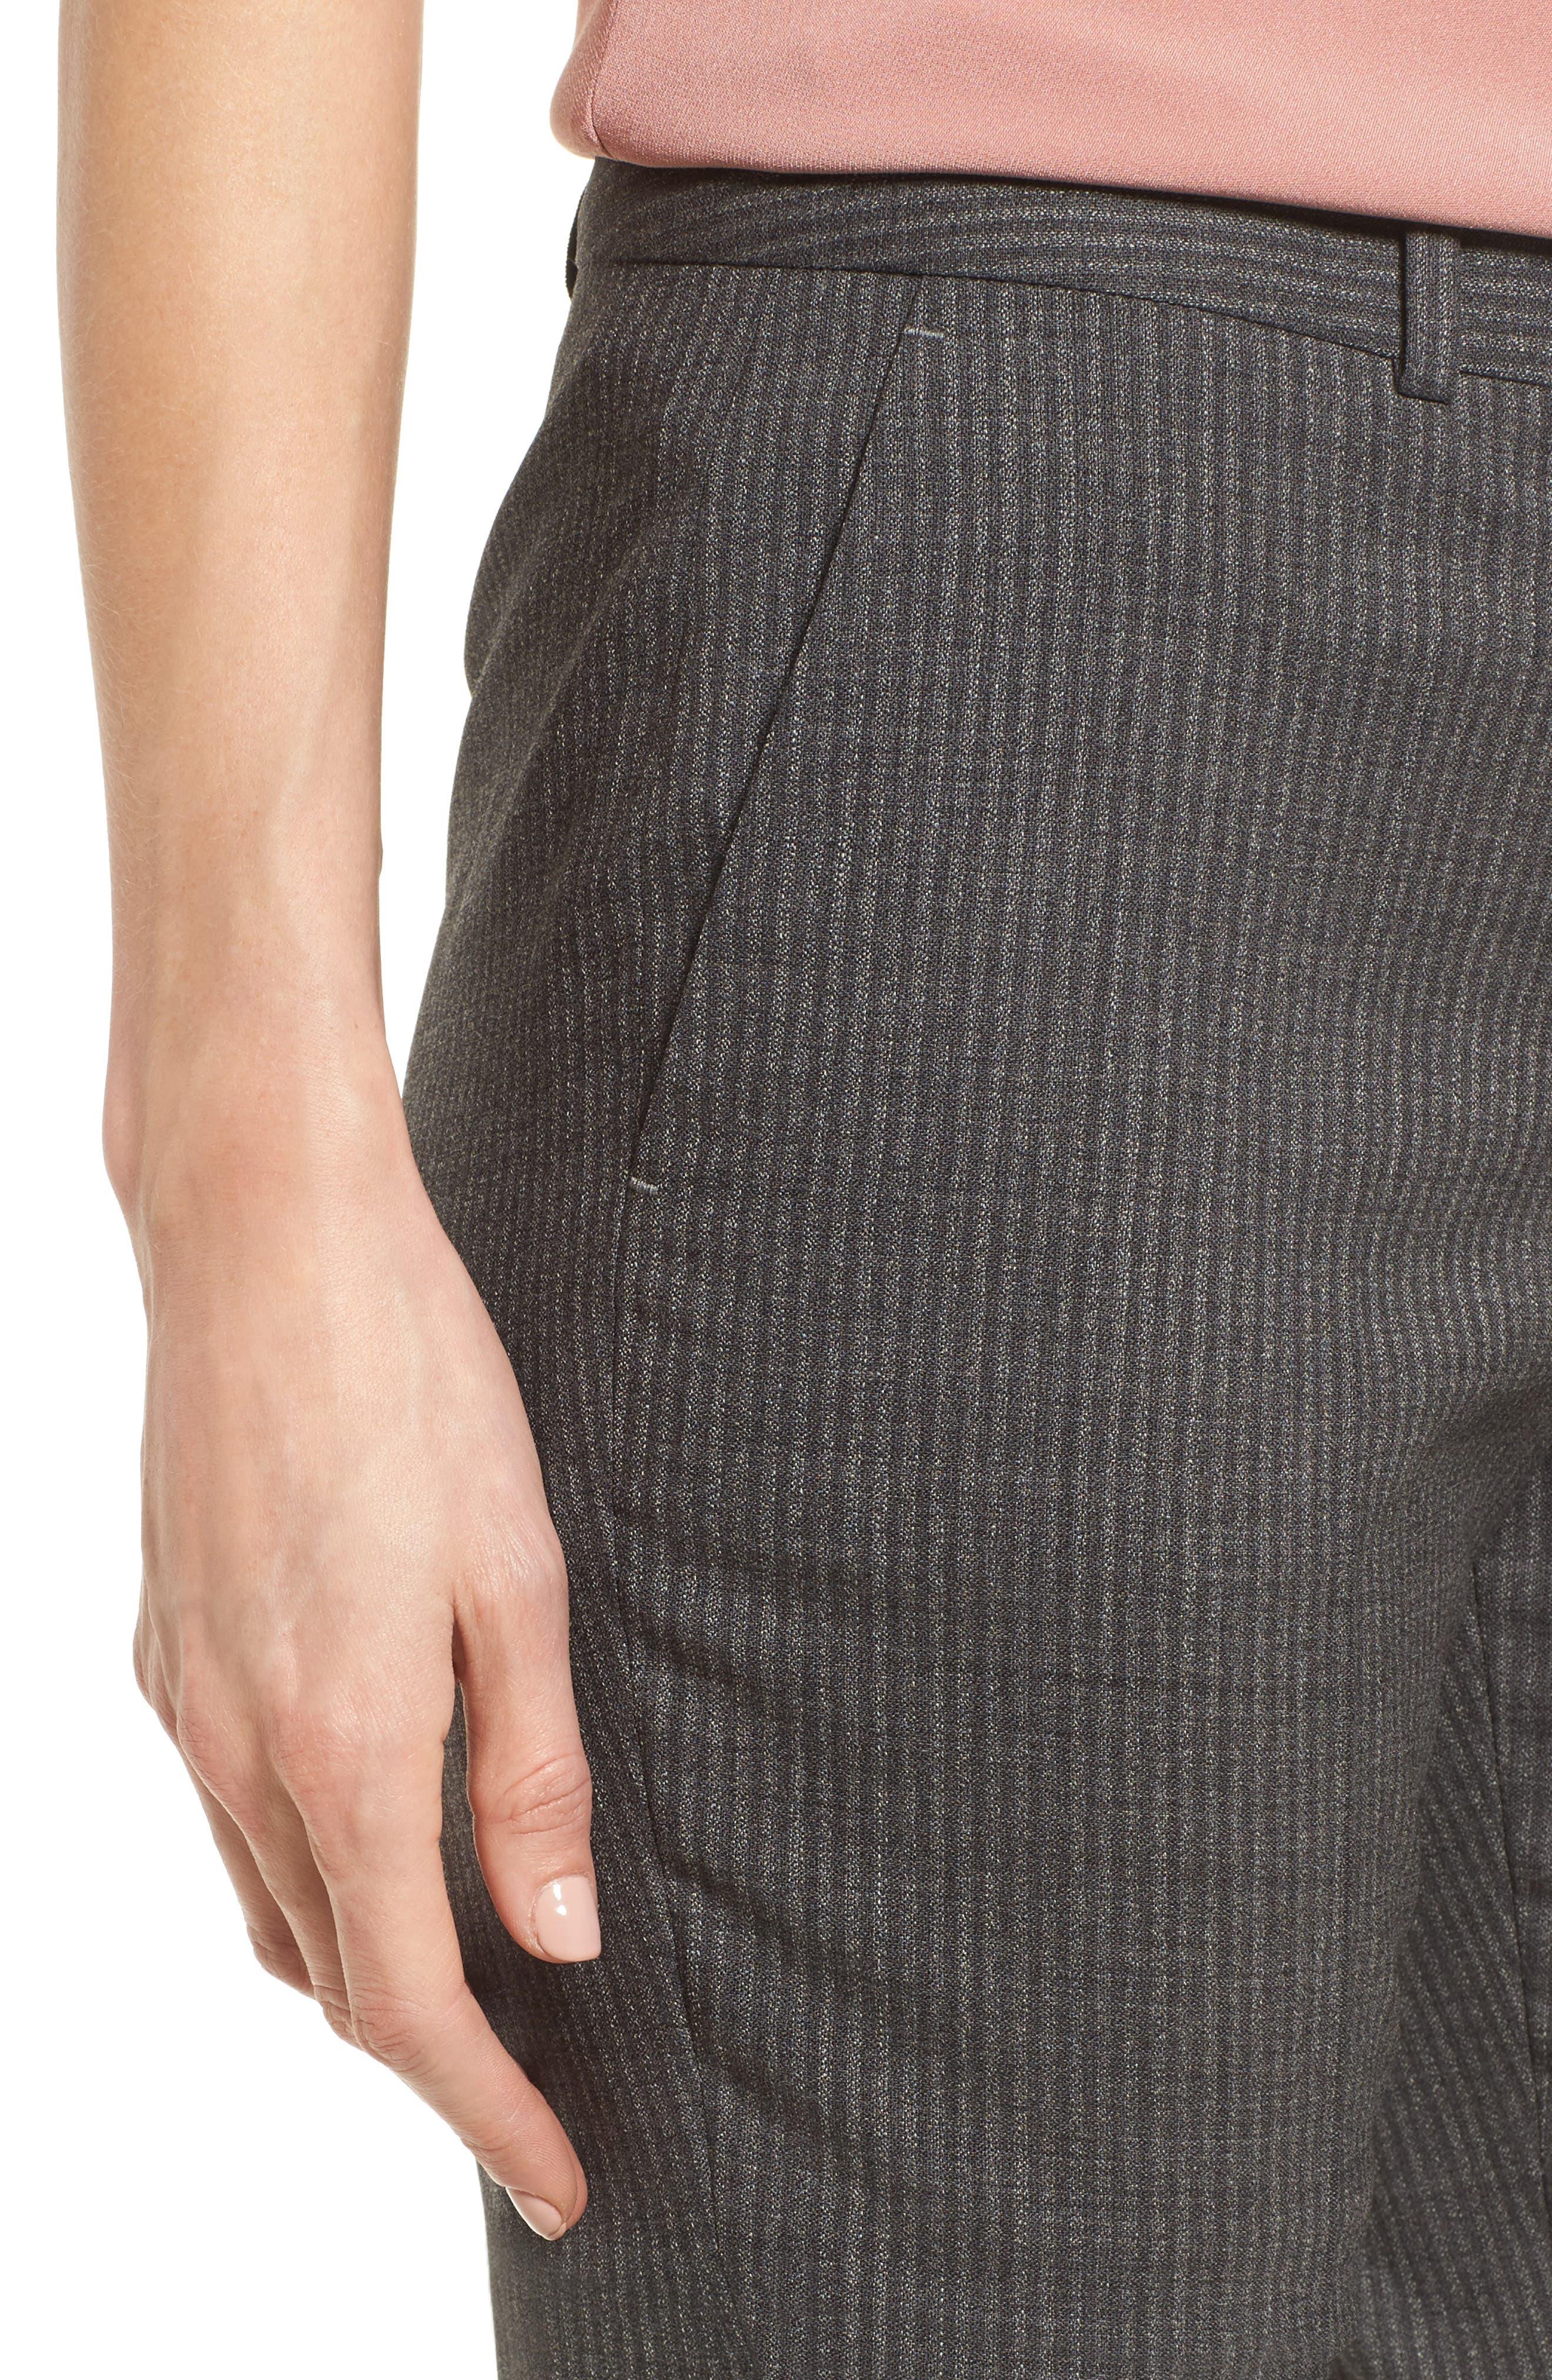 Titana Stretch Wool Trousers,                             Alternate thumbnail 4, color,                             Dark Grey Fantasy